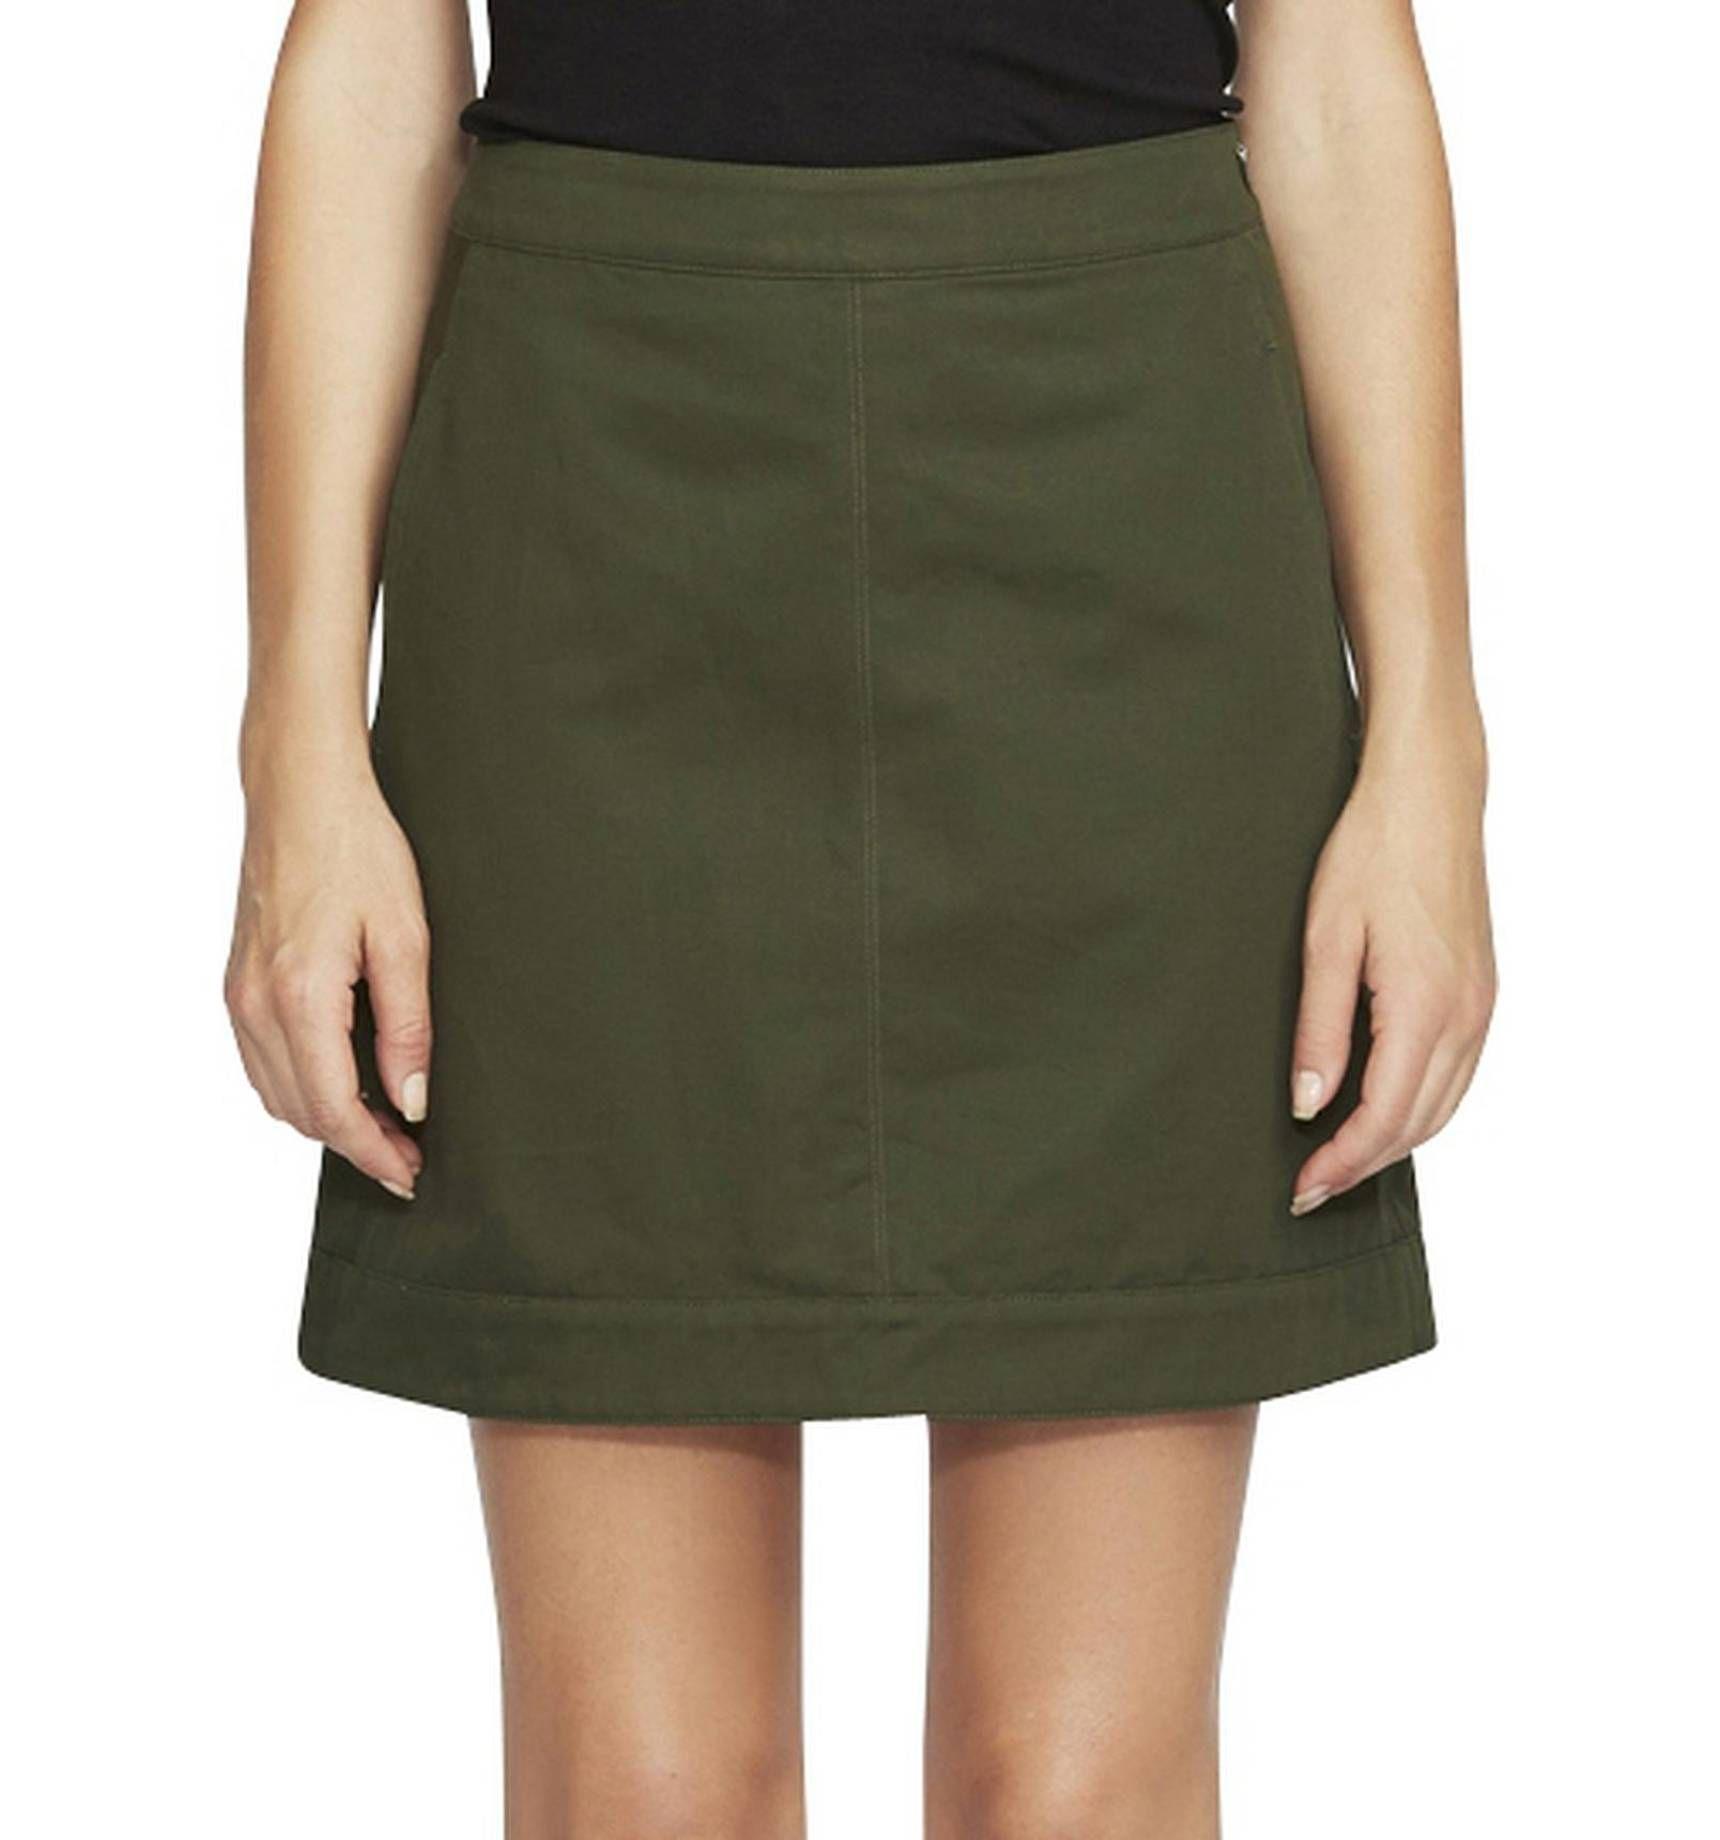 Wooster Basic Skirt C&M (With images) Basic skirt